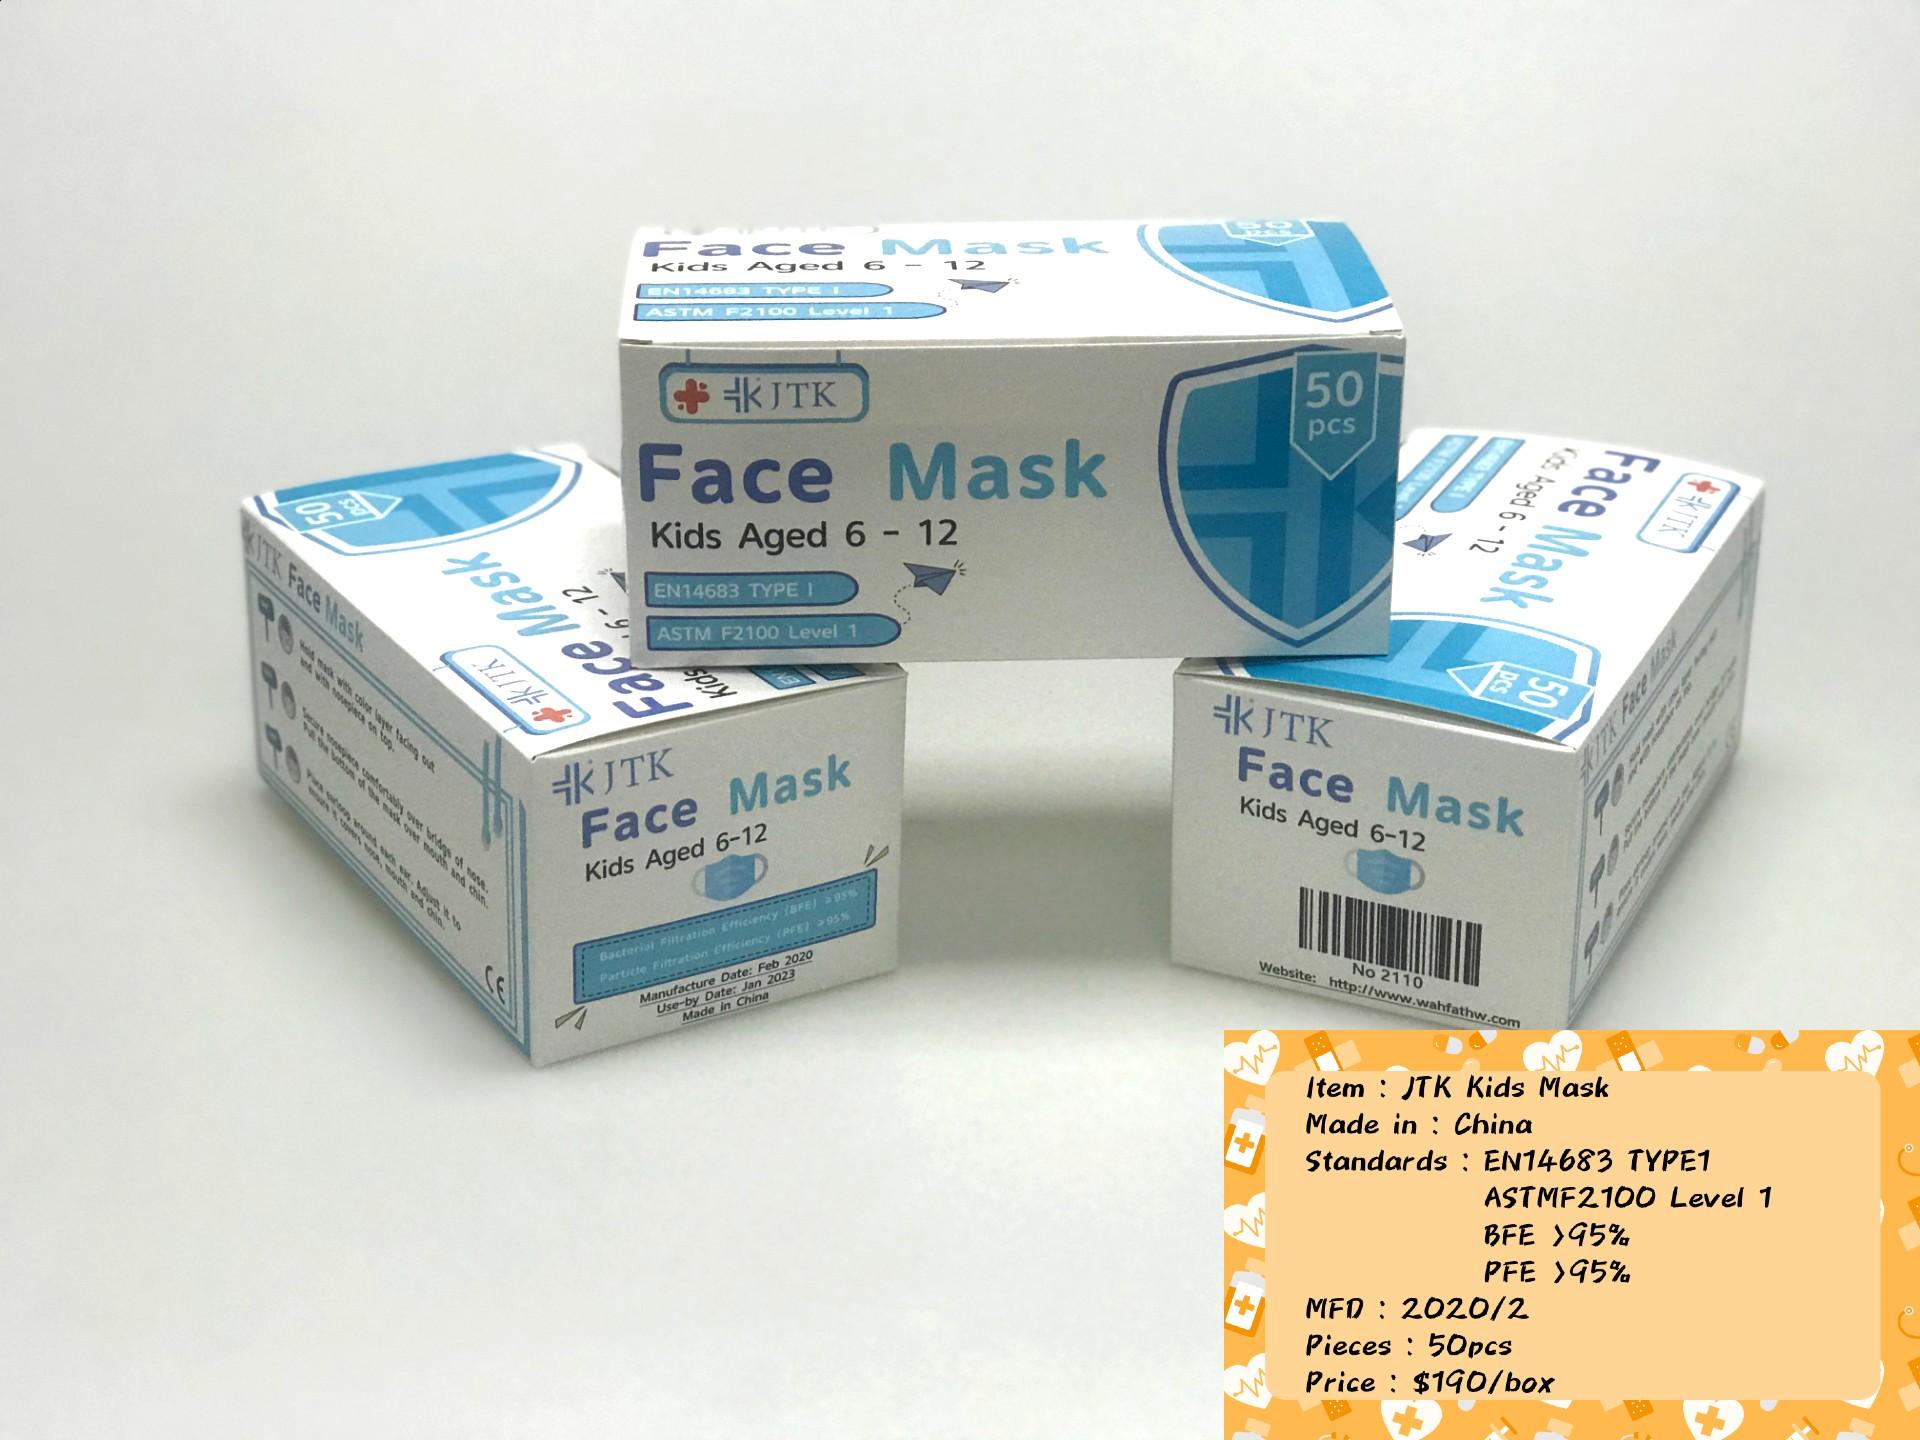 JTK Kids Mask (1)